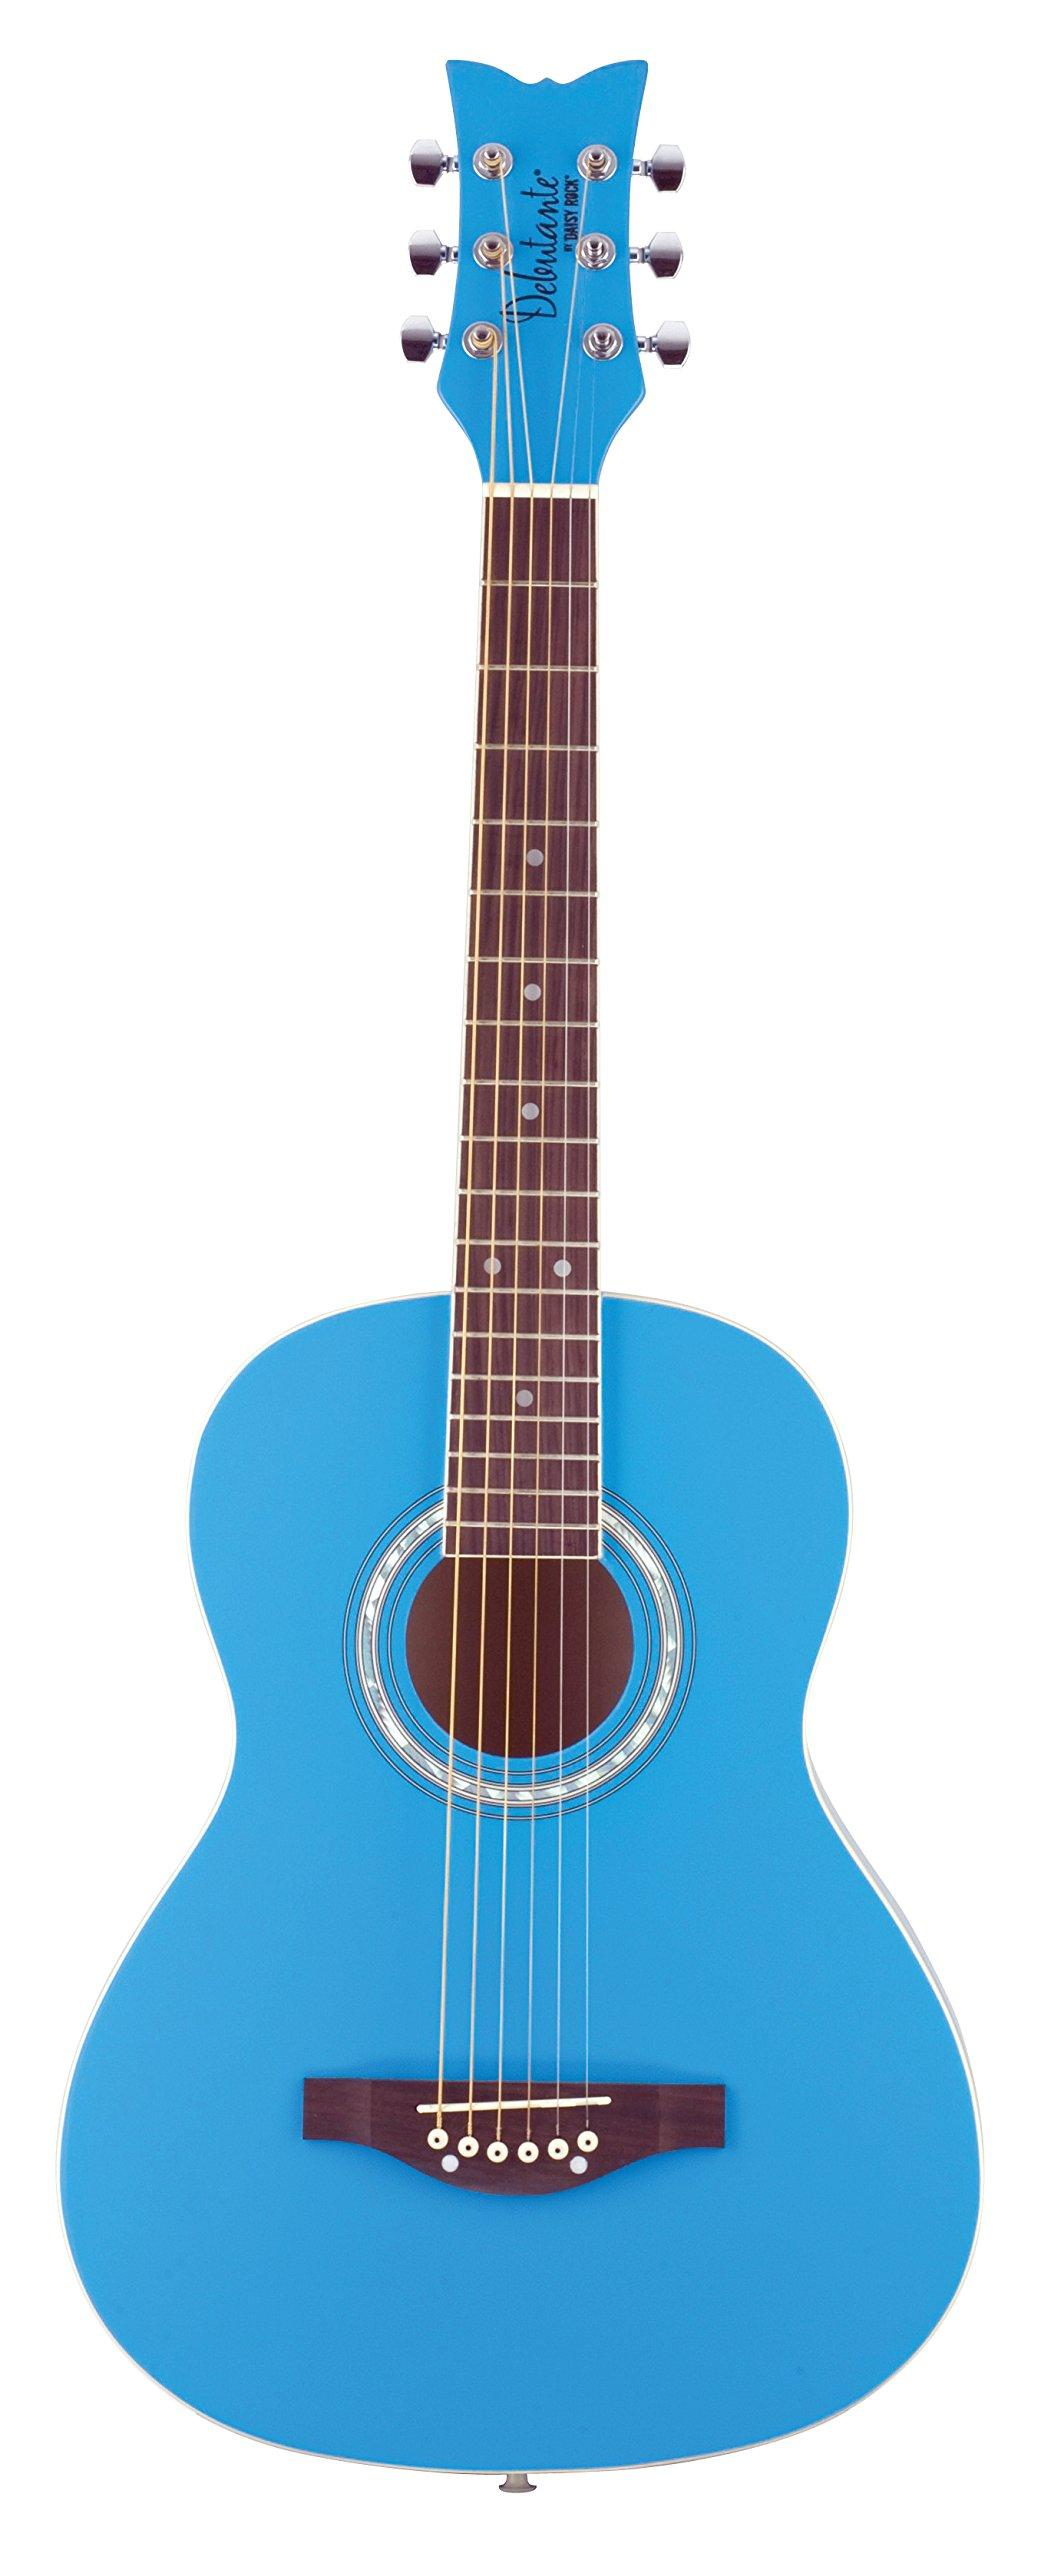 Daisy Rock Debutante Jr. Miss Acoustic Short Scale Cotton Candy Blue Guitar by Daisy Rock (Image #1)